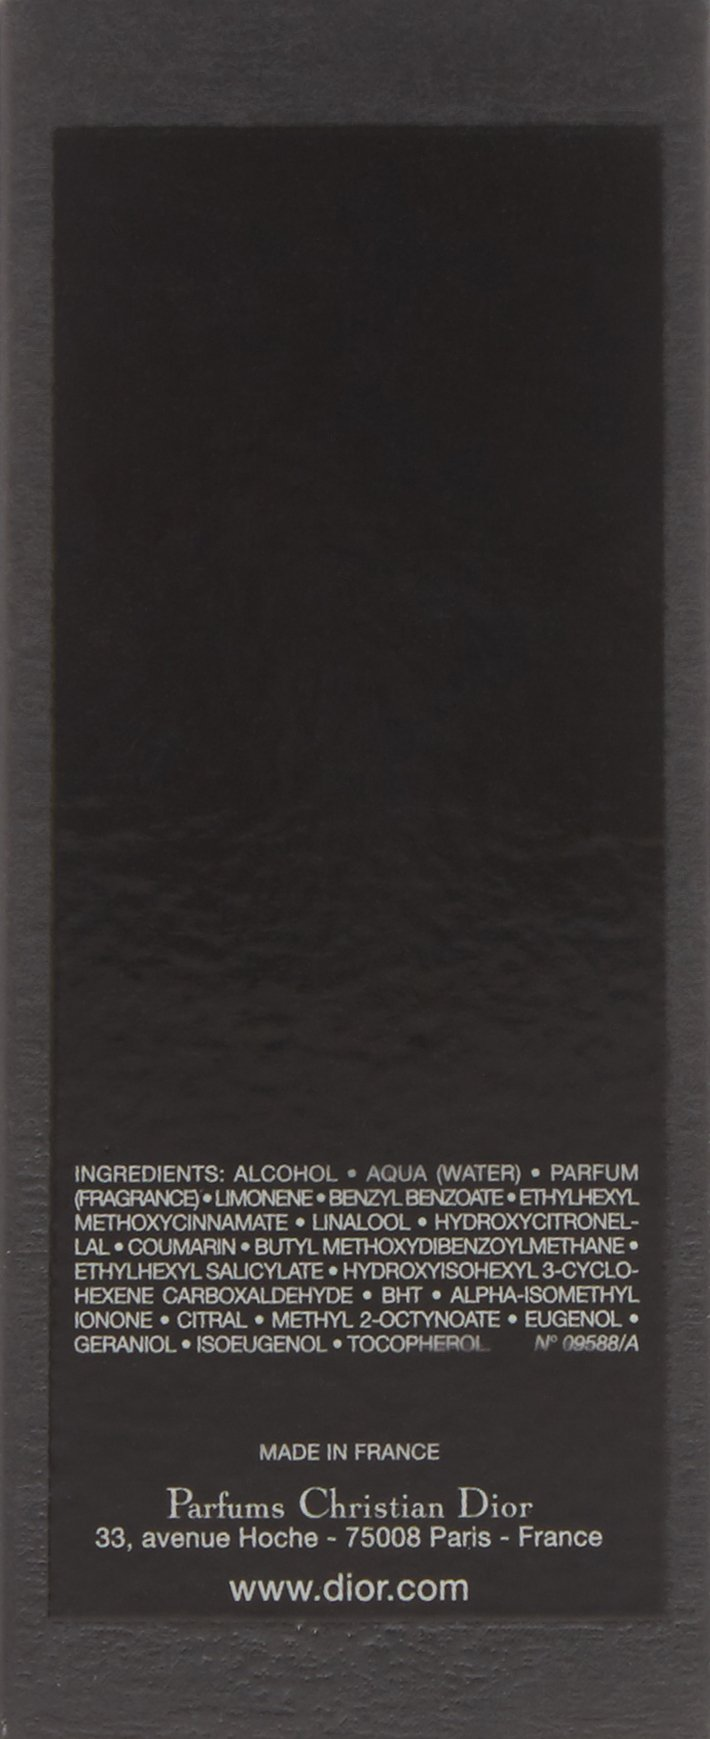 Fahrenheit By Christian Dior For Men. Eau De Toilette Spray 1.7 Ounces by Dior (Image #2)